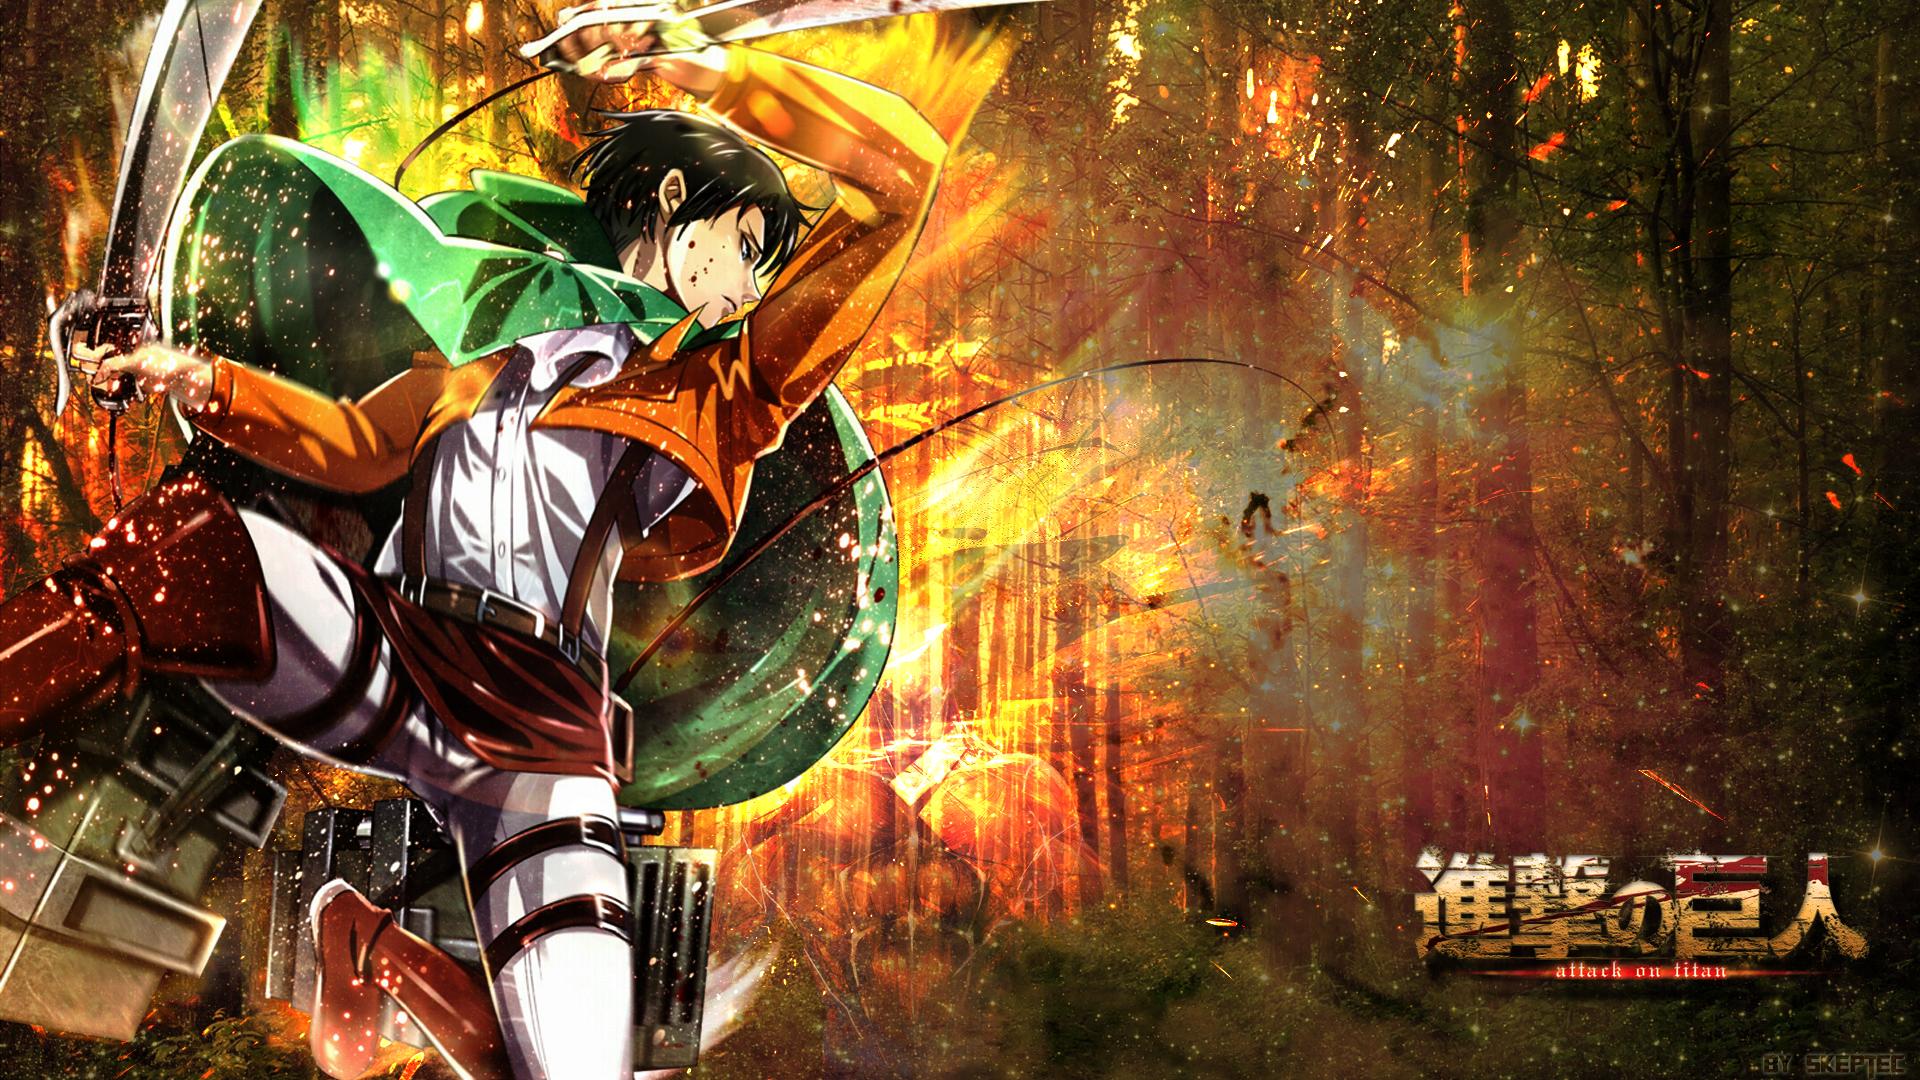 Attack on Titan - Levi Wallpaper - Woodland by skeptec on DeviantArt